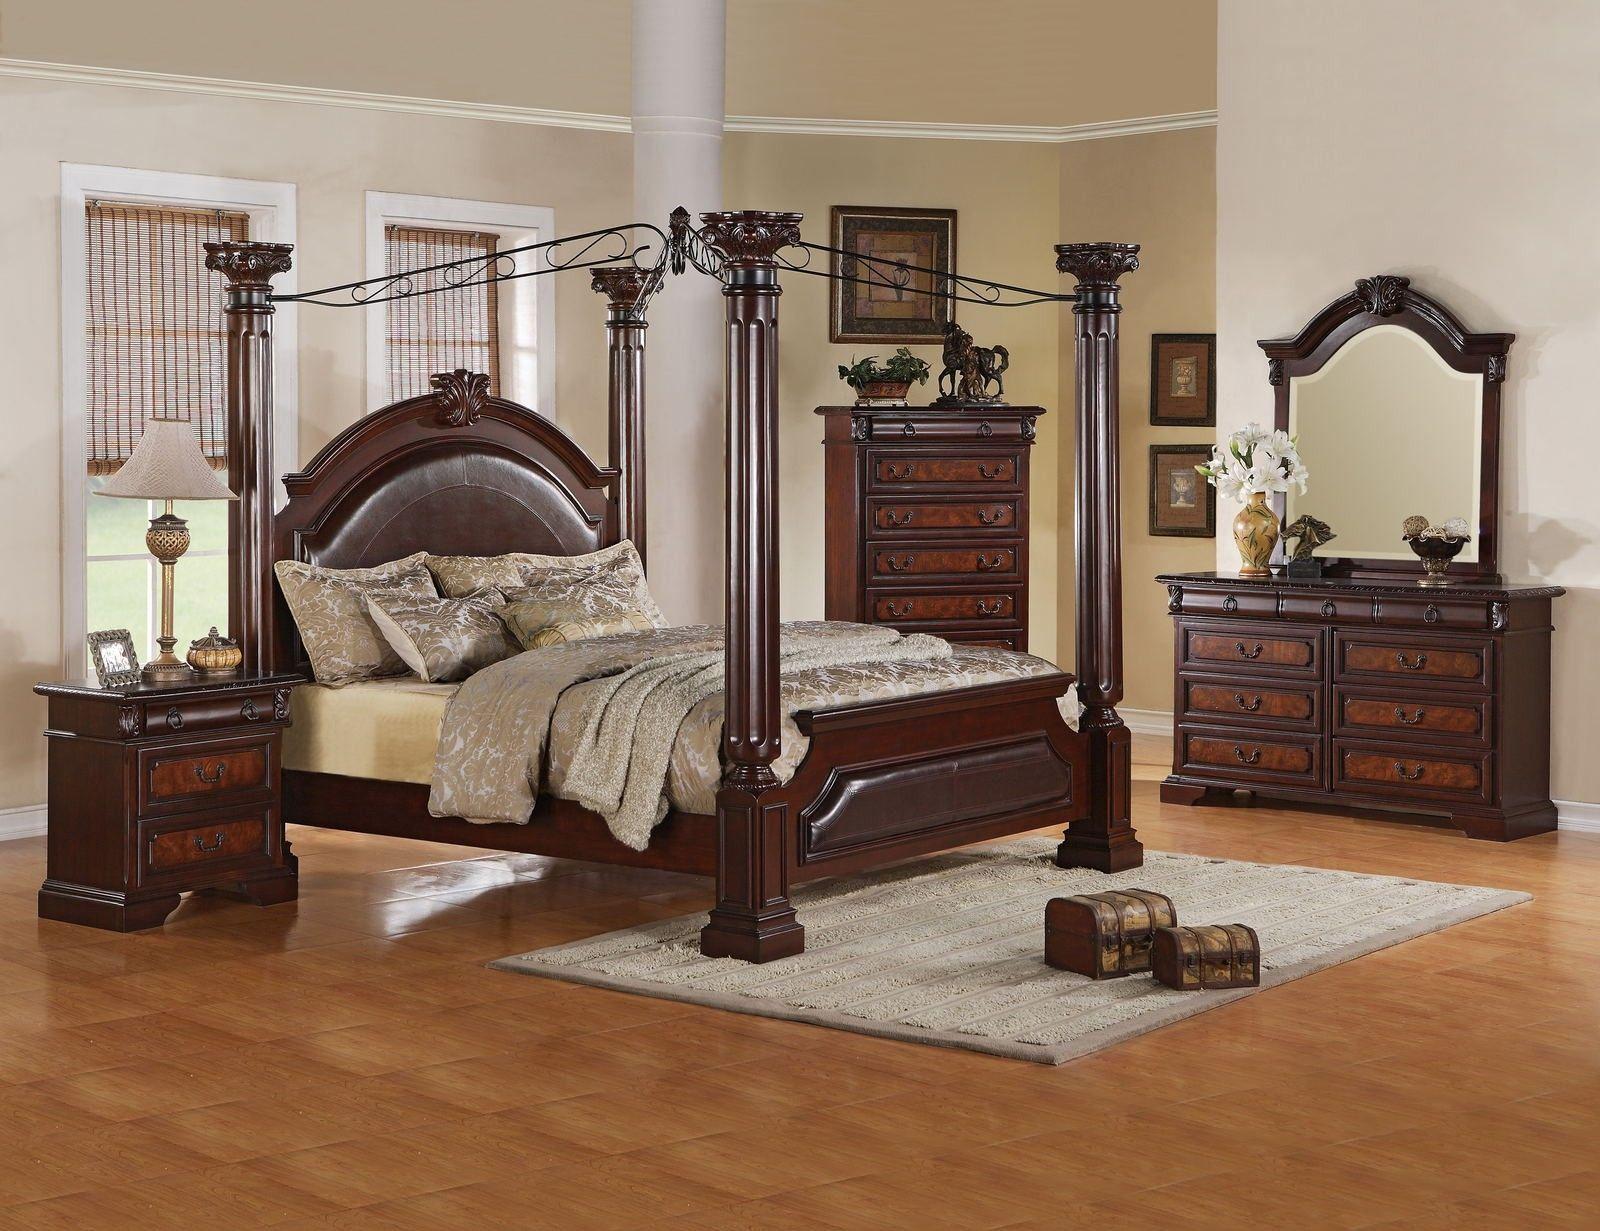 Superb Monticello Canopy Bedroom Set